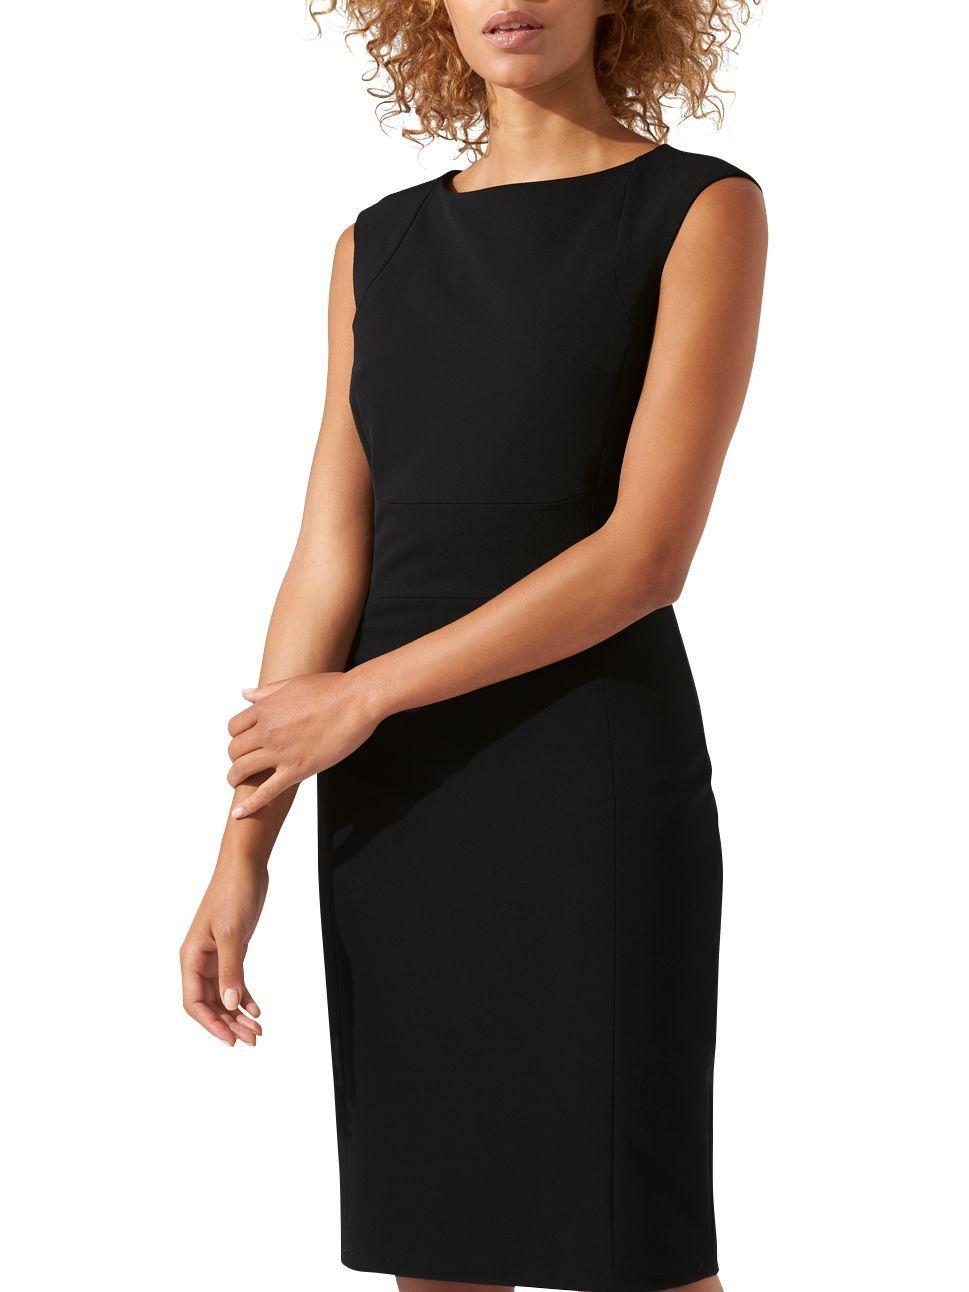 Jigsaw Paris Fit Sleeveless Dress, Black #blacksleevelessdress